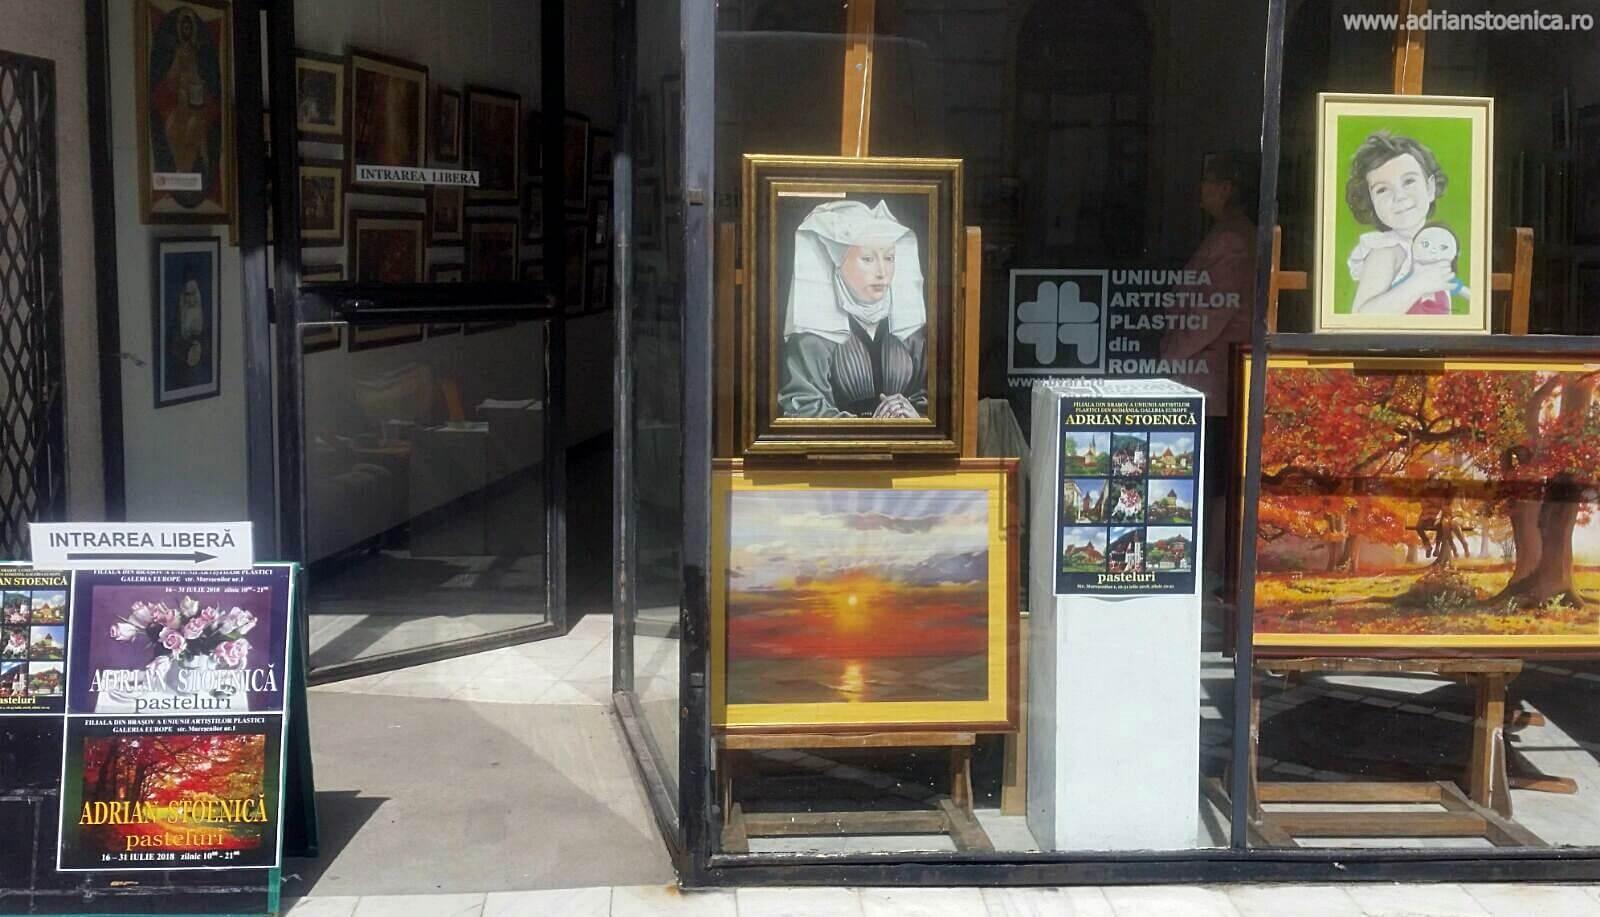 expozitie-de-pictura-brasov-adrian-stoenica-2018-slider-ok